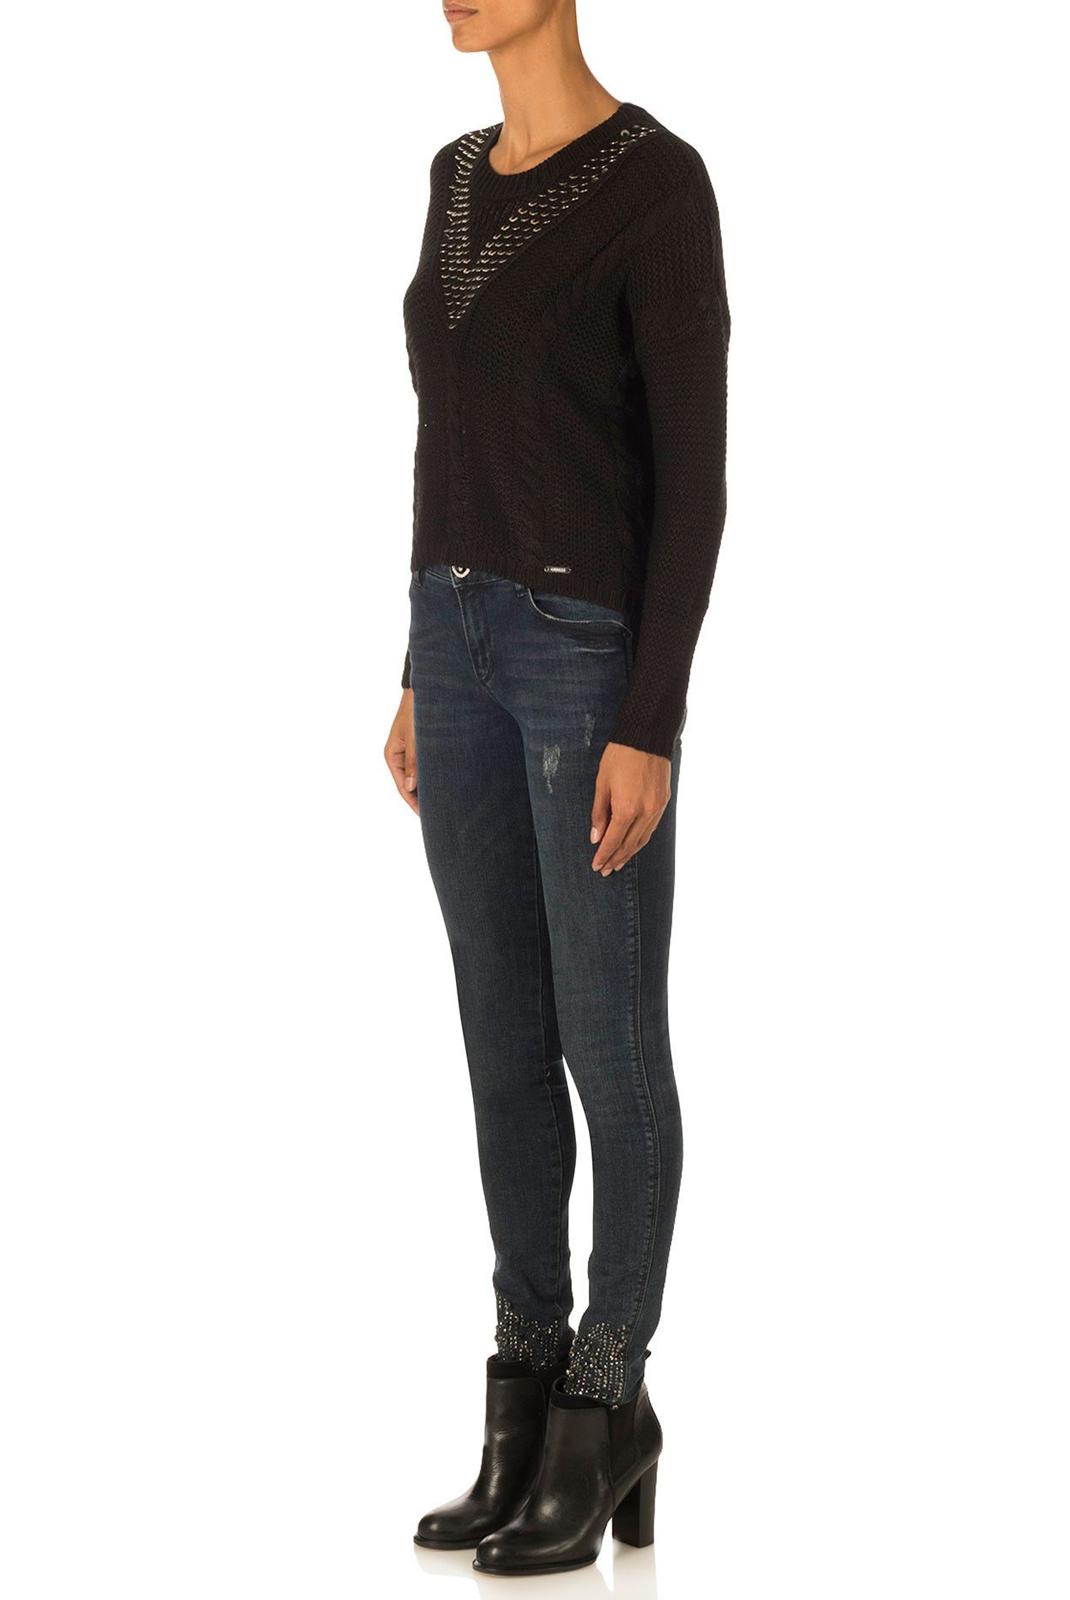 FEMME  Guess jeans W74R69 Z1OP0 A996 NOIR